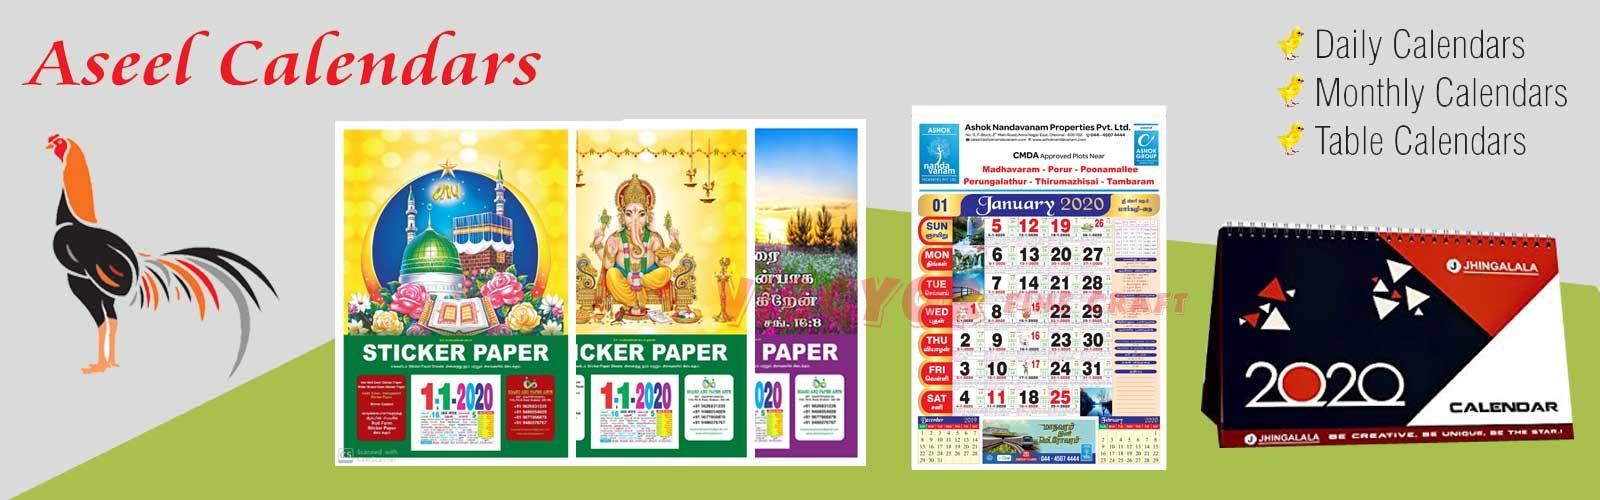 Aseel Calendars